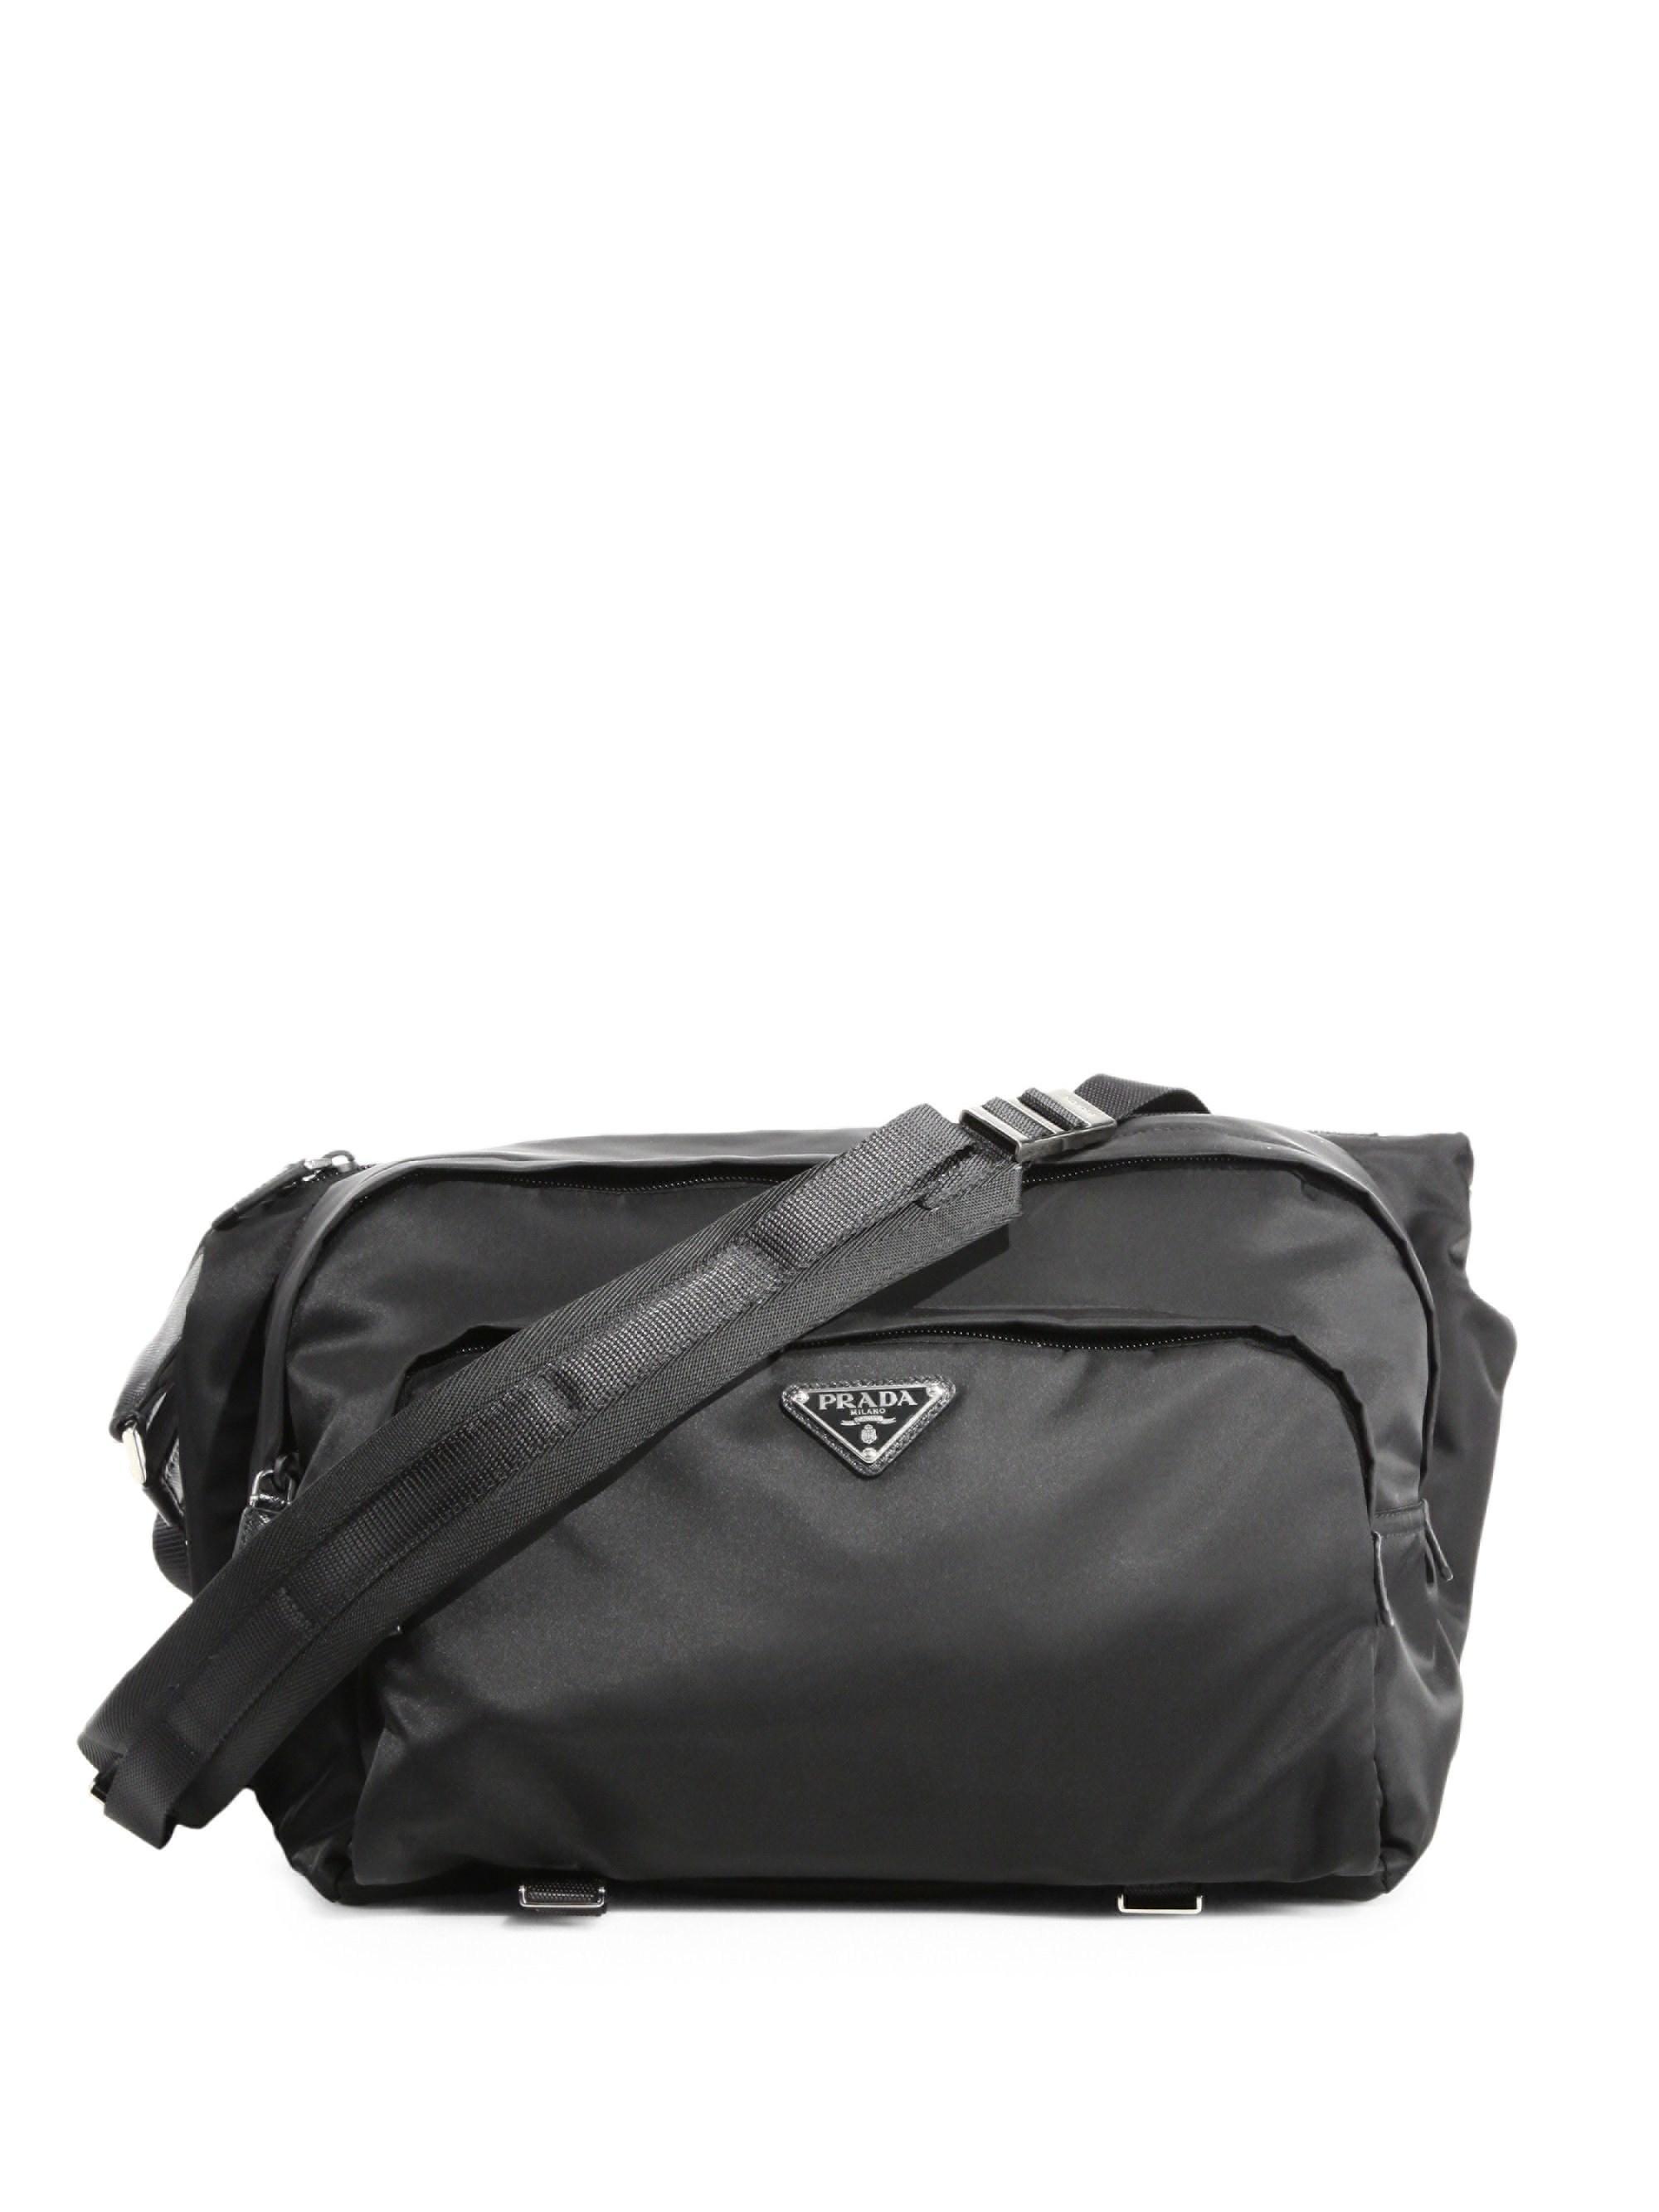 3f2ed3e49ca5 Prada - Black Bandoliera Nylon Waist Pack for Men - Lyst. View fullscreen